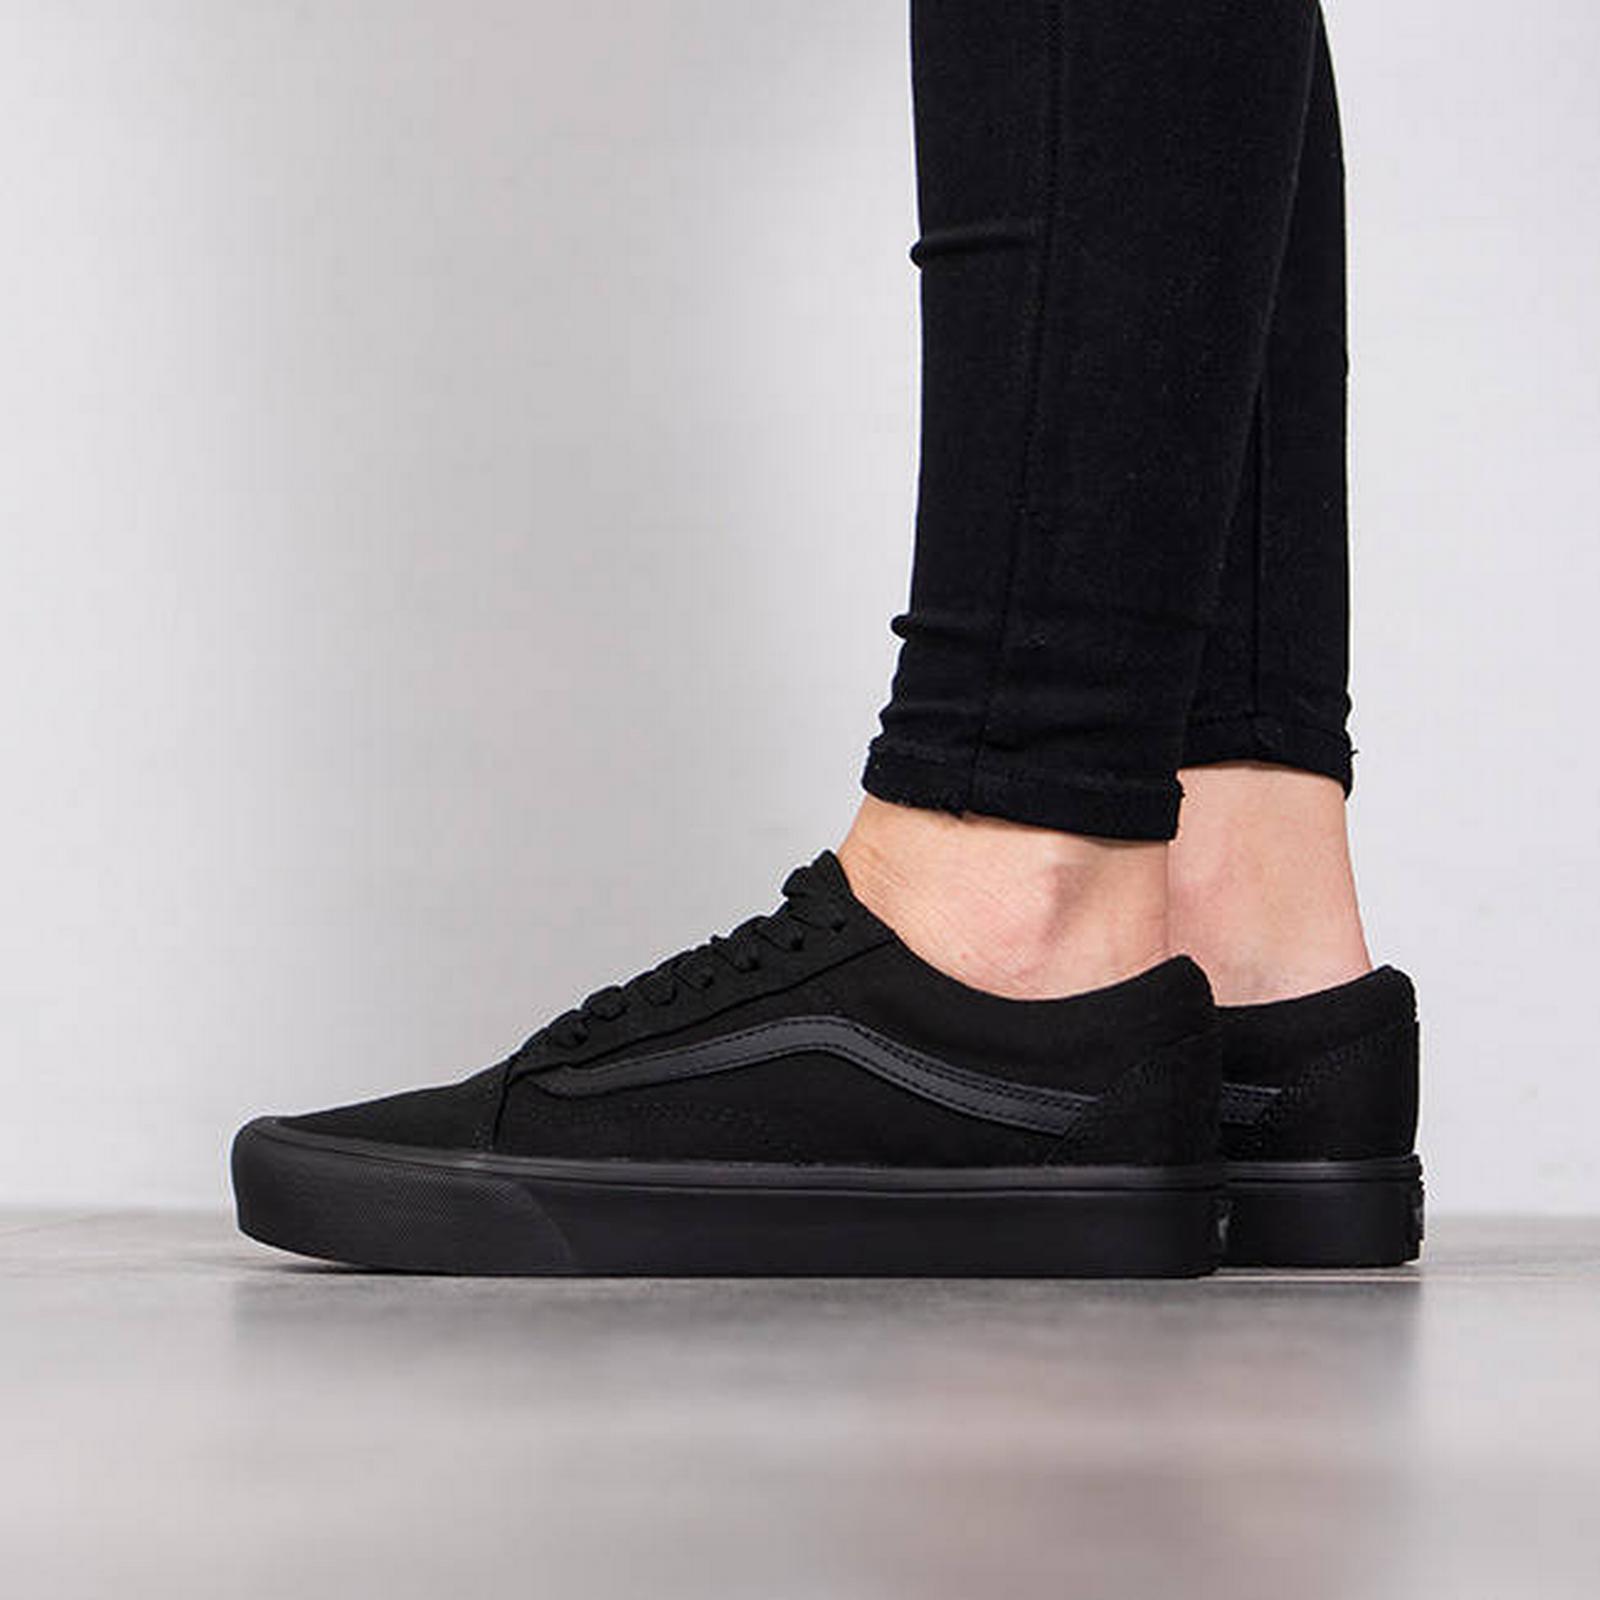 Vans Women's Shoes BLACK sneakers Vans Old Skool Lite A2Z5W186 BLACK Shoes Size 40,5 c17fc6